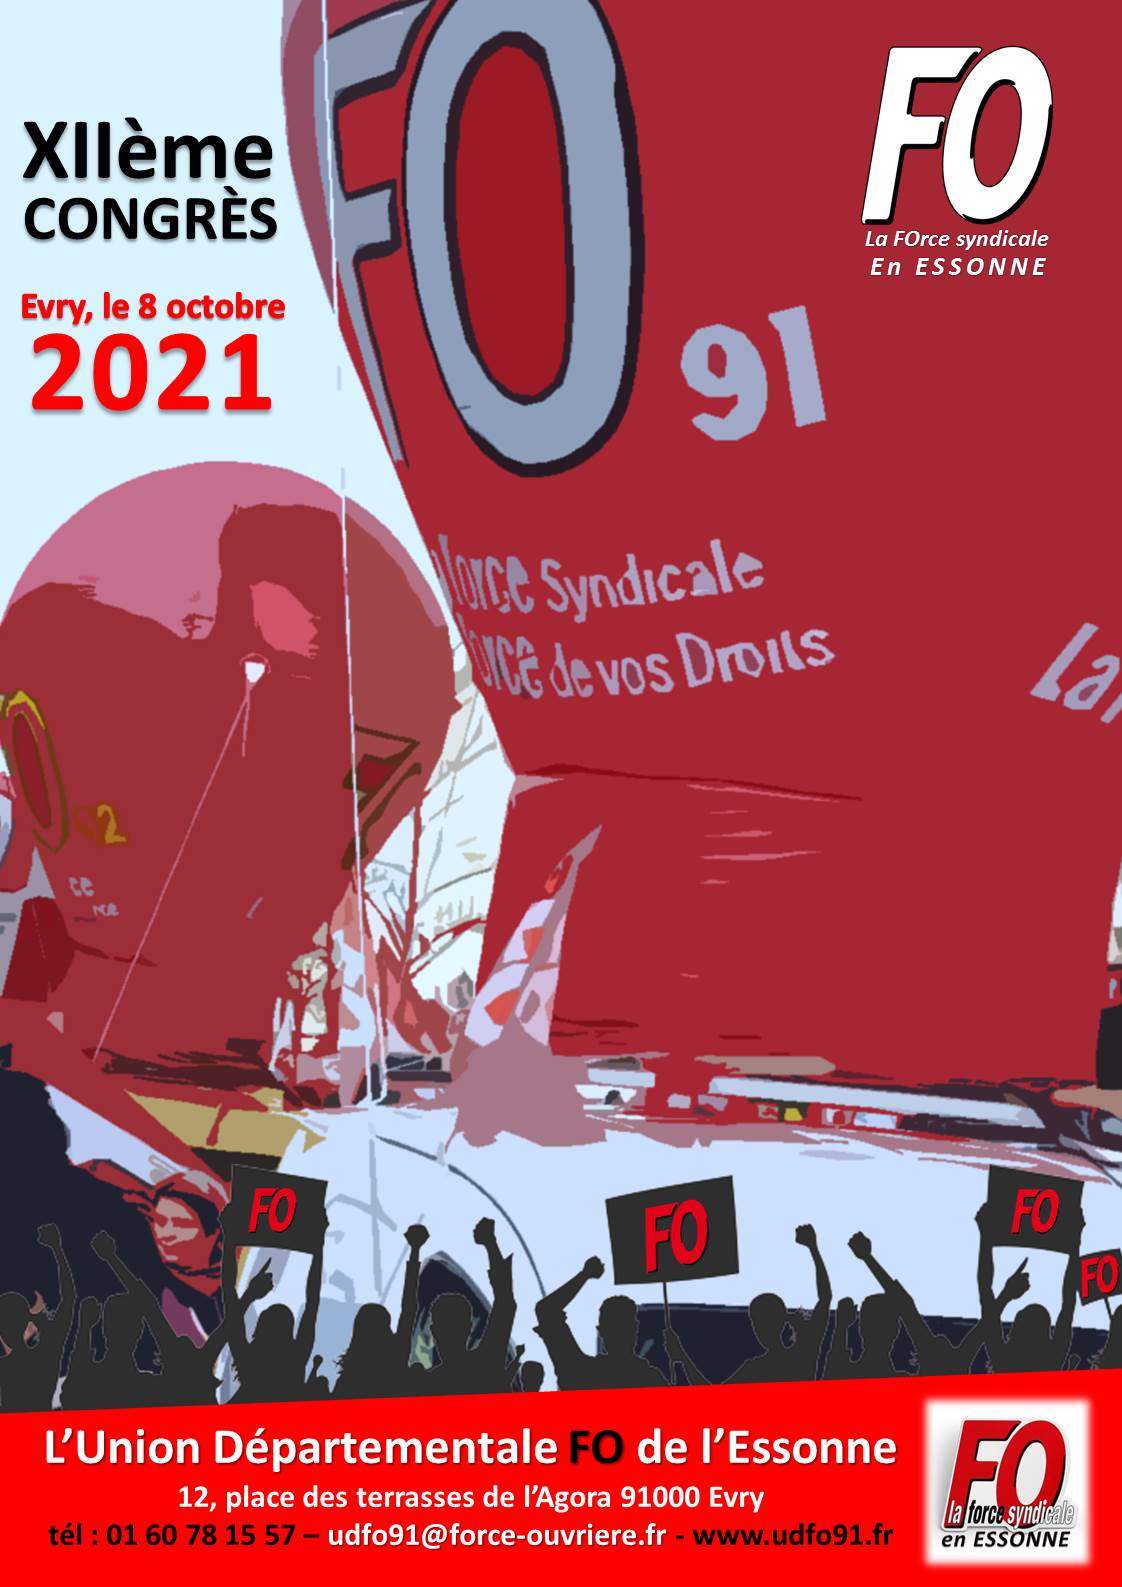 Image of XIIème CONGRES de l'UD FO 91